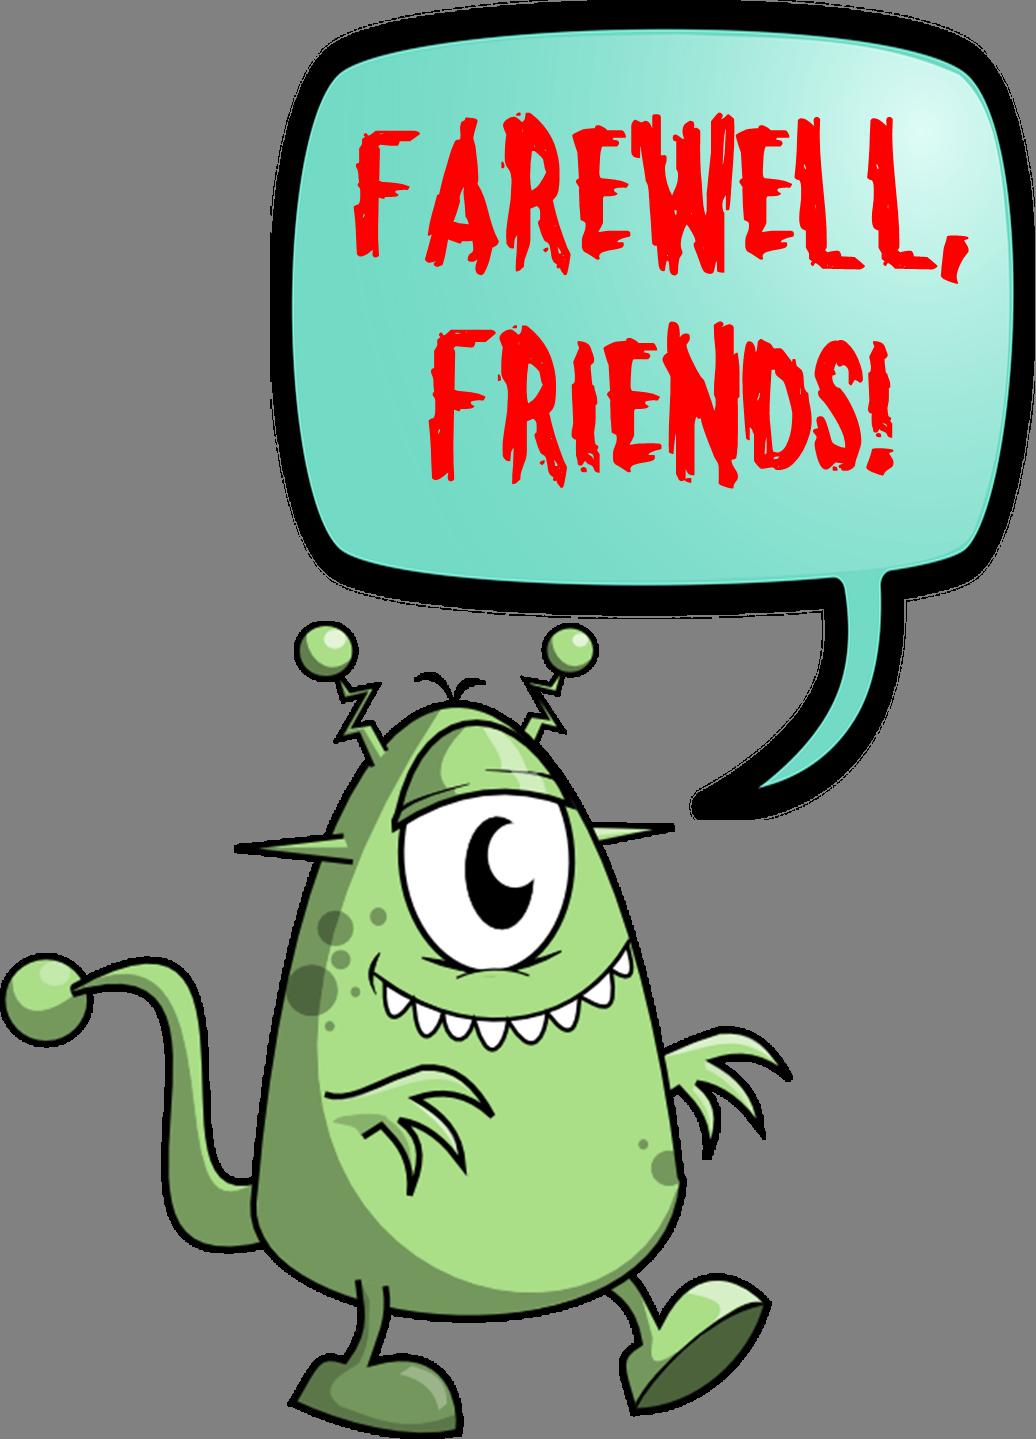 Free Farewell Cliparts, Download Free Clip Art, Free Clip.